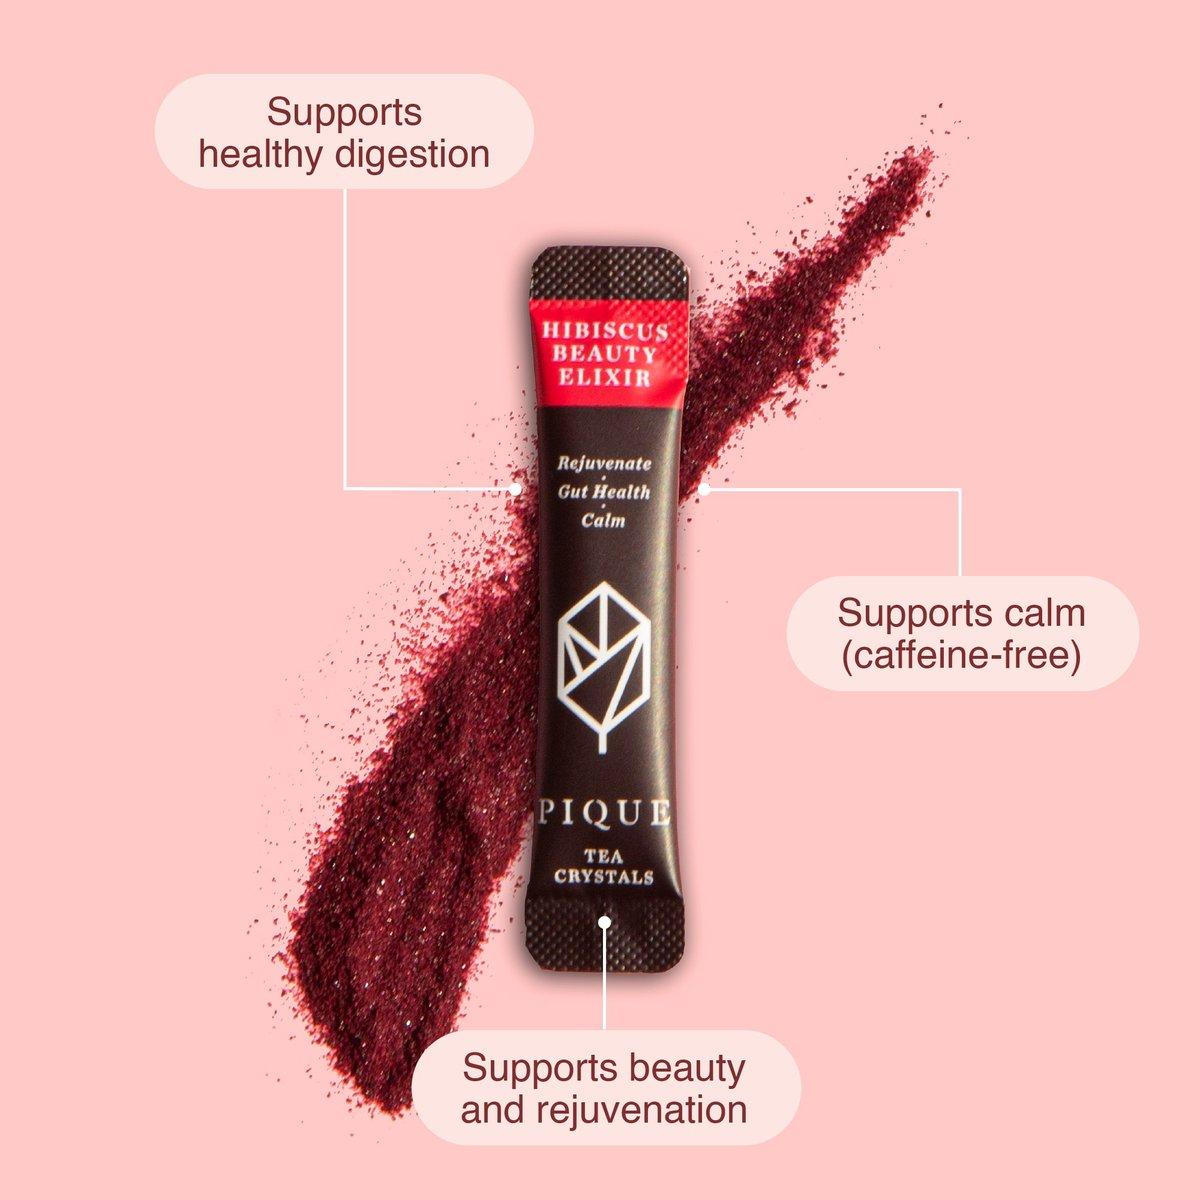 Hibiscus Beauty Elixir Sachet listing benefits